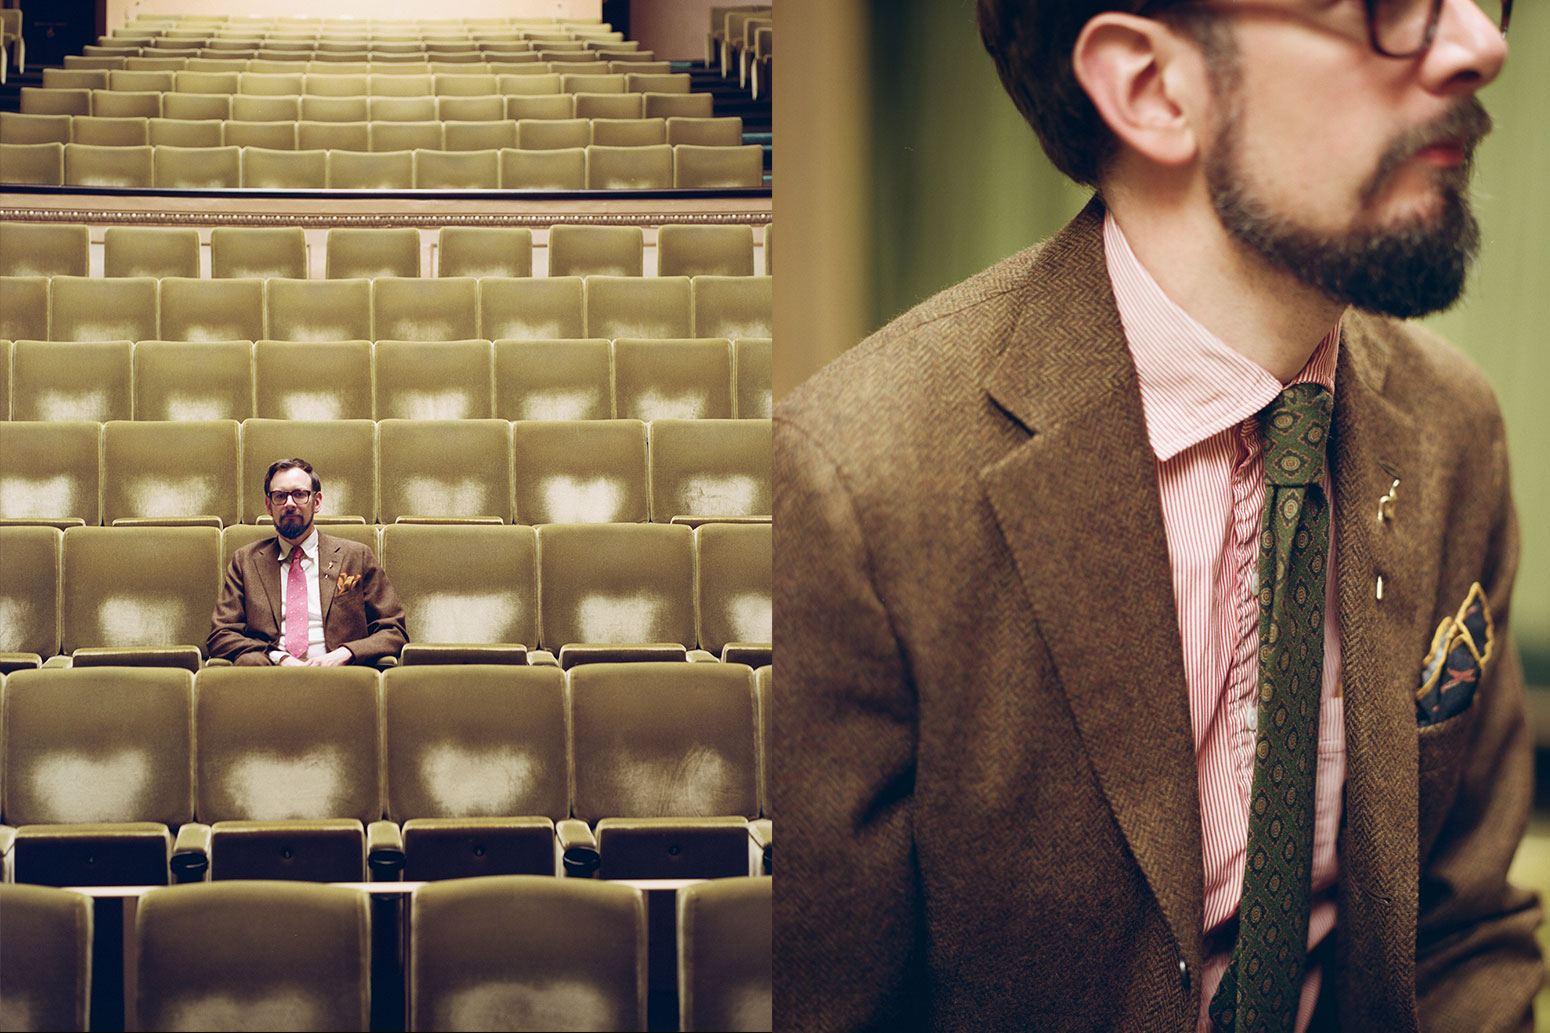 The Bureau: Film Critic and Broadcaster, Robbie Collin